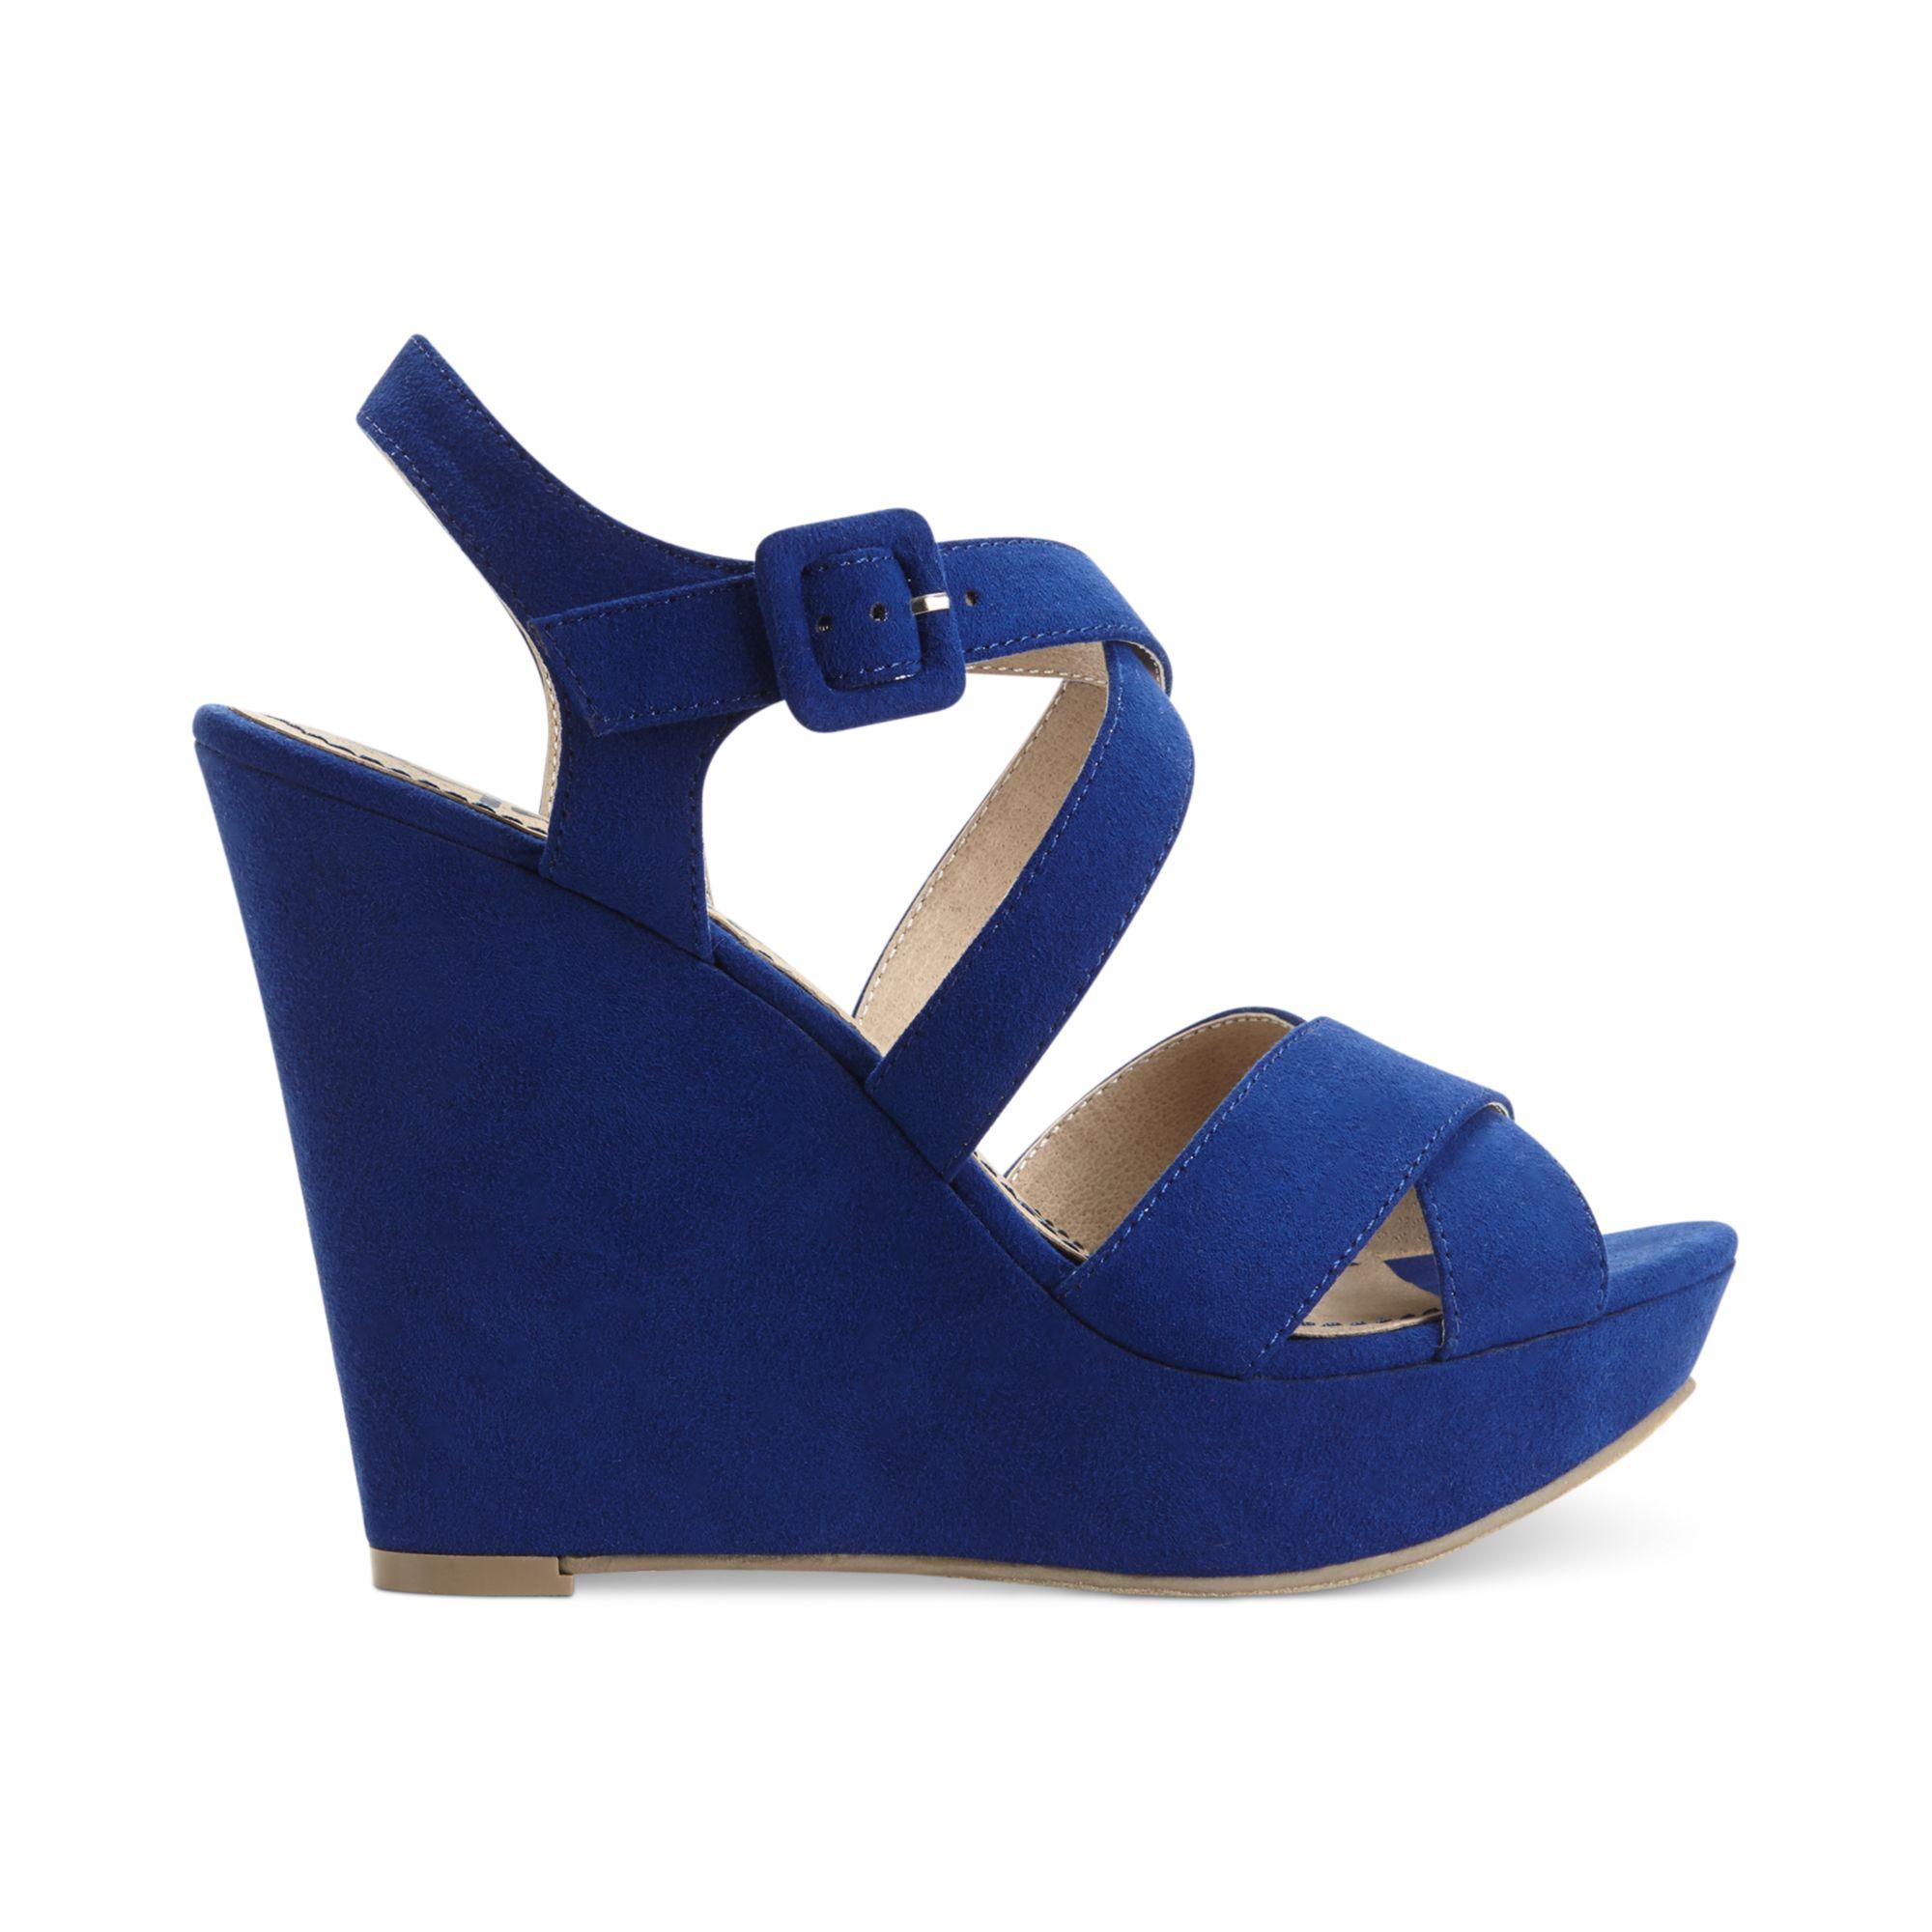 american rag rachey platform wedge sandals in blue cobalt